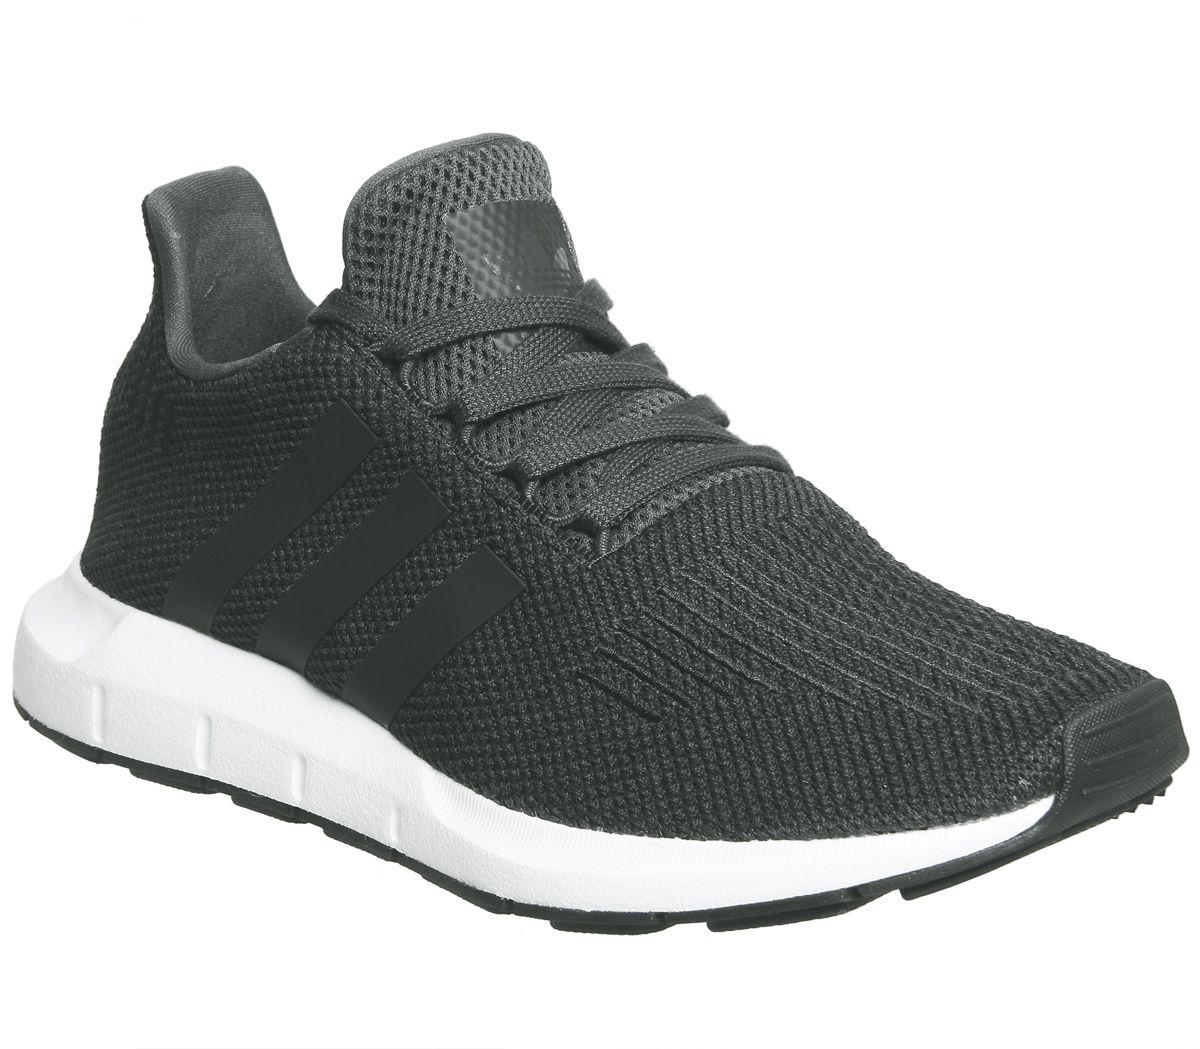 40e3d5227 adidas Swift Run Trainers Carbon - Unisex Sports